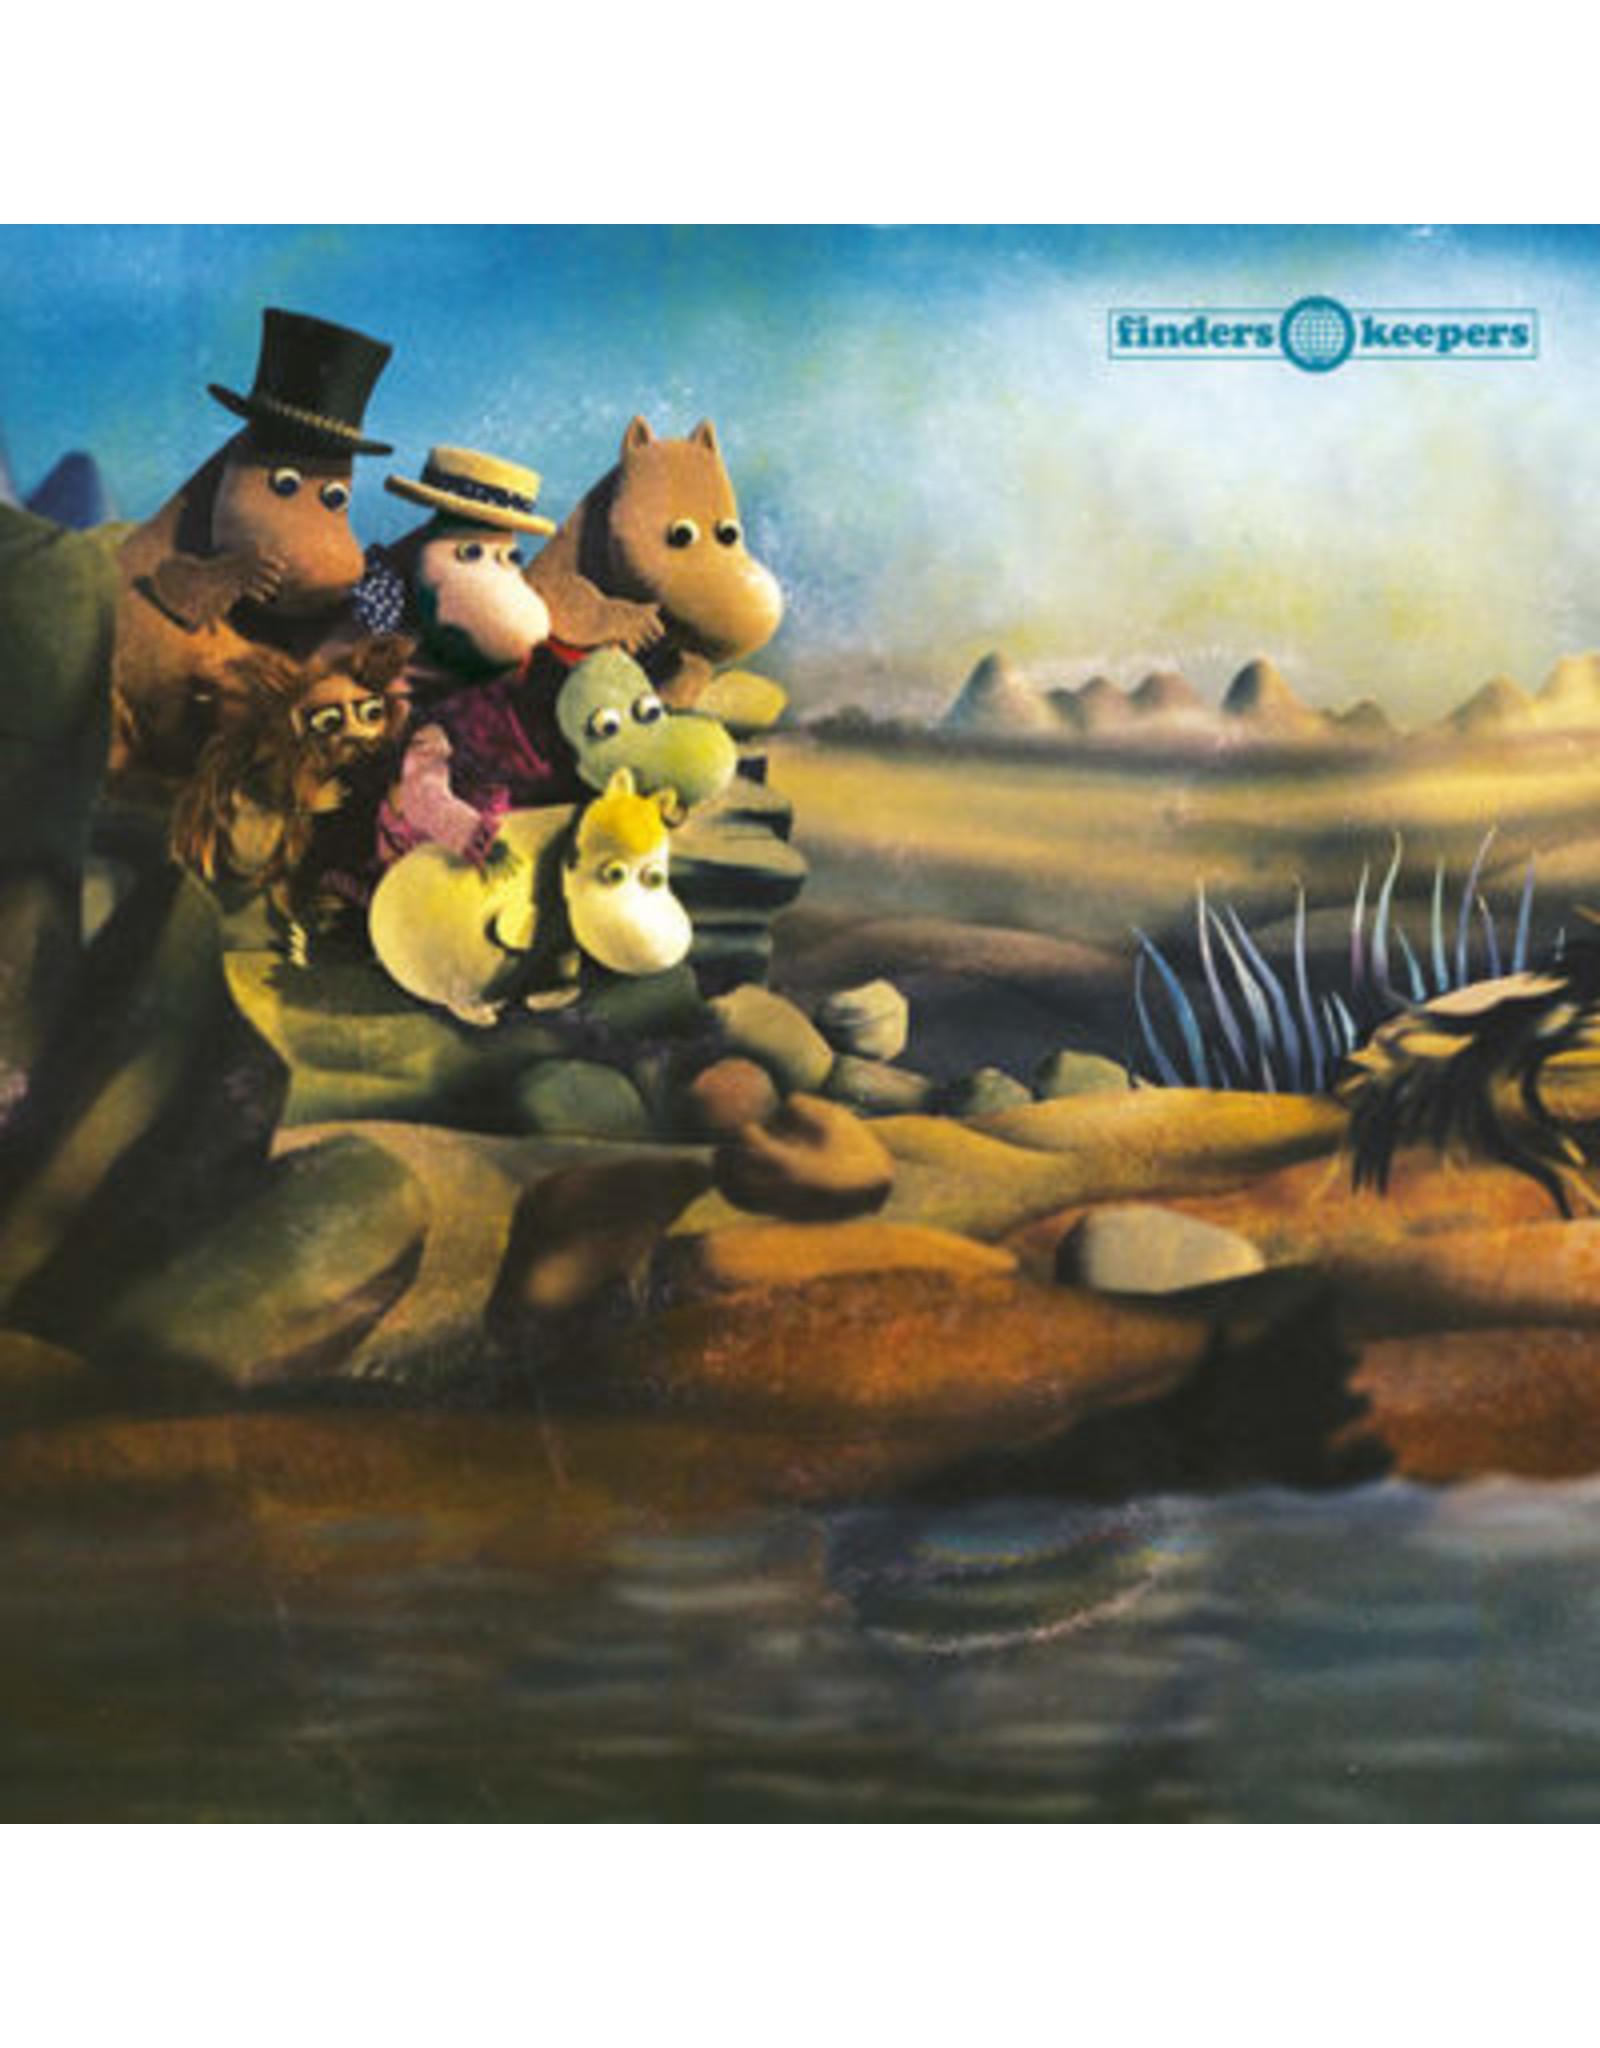 Finders Keepers Moomins OST LP